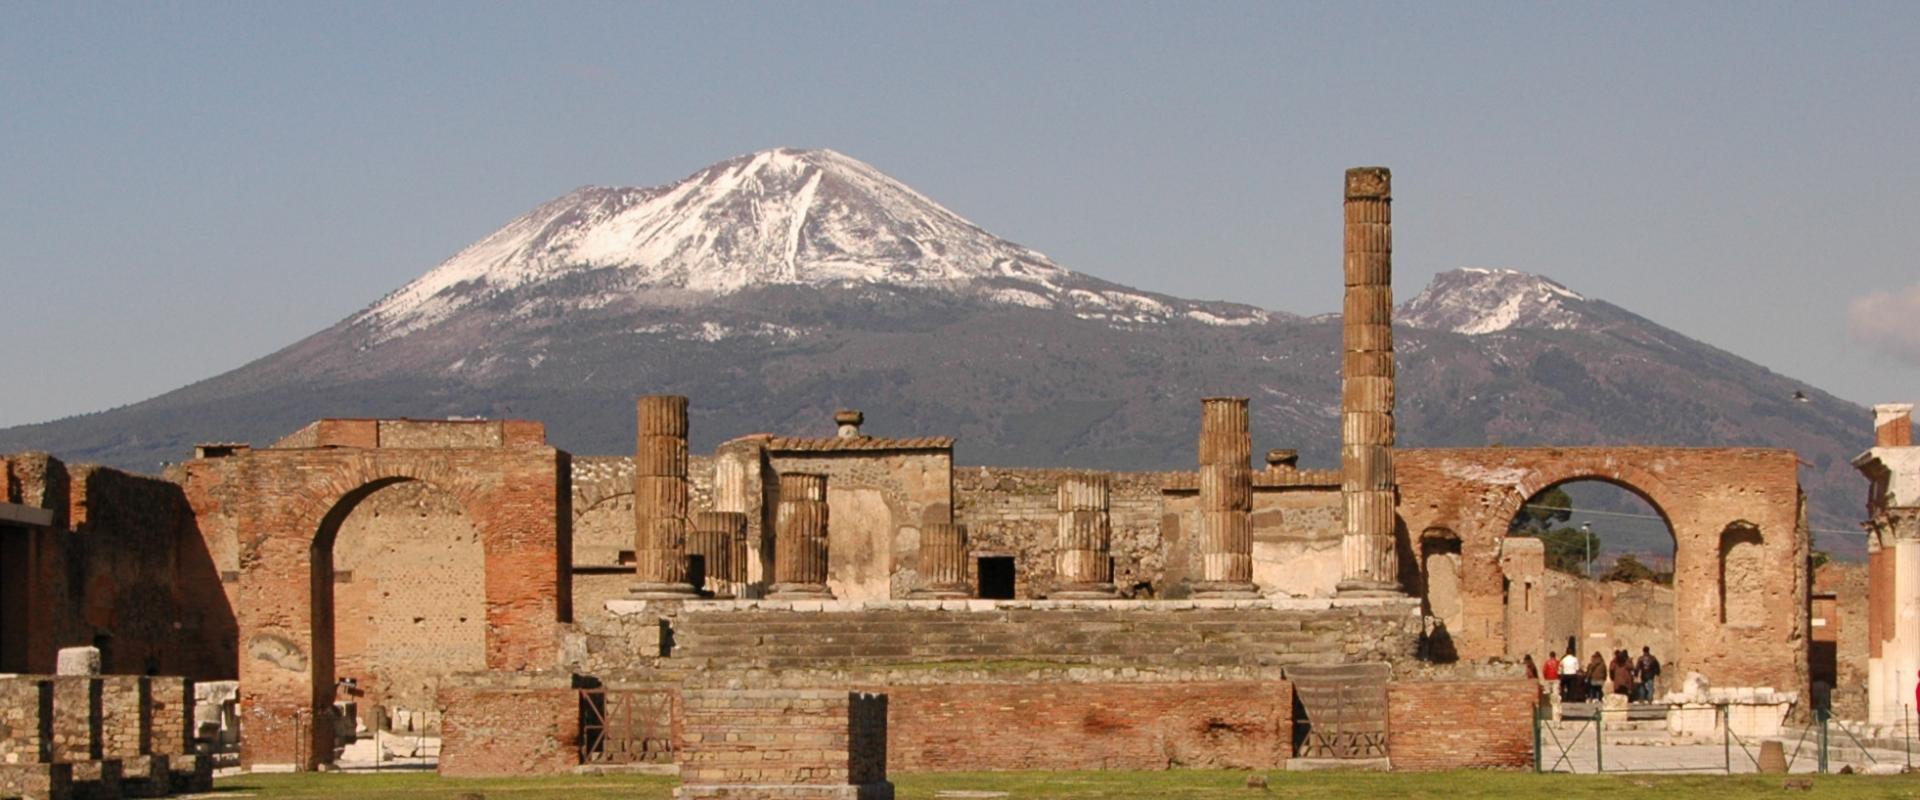 Amalfi Coast, Pompei & Herculaneum Tours